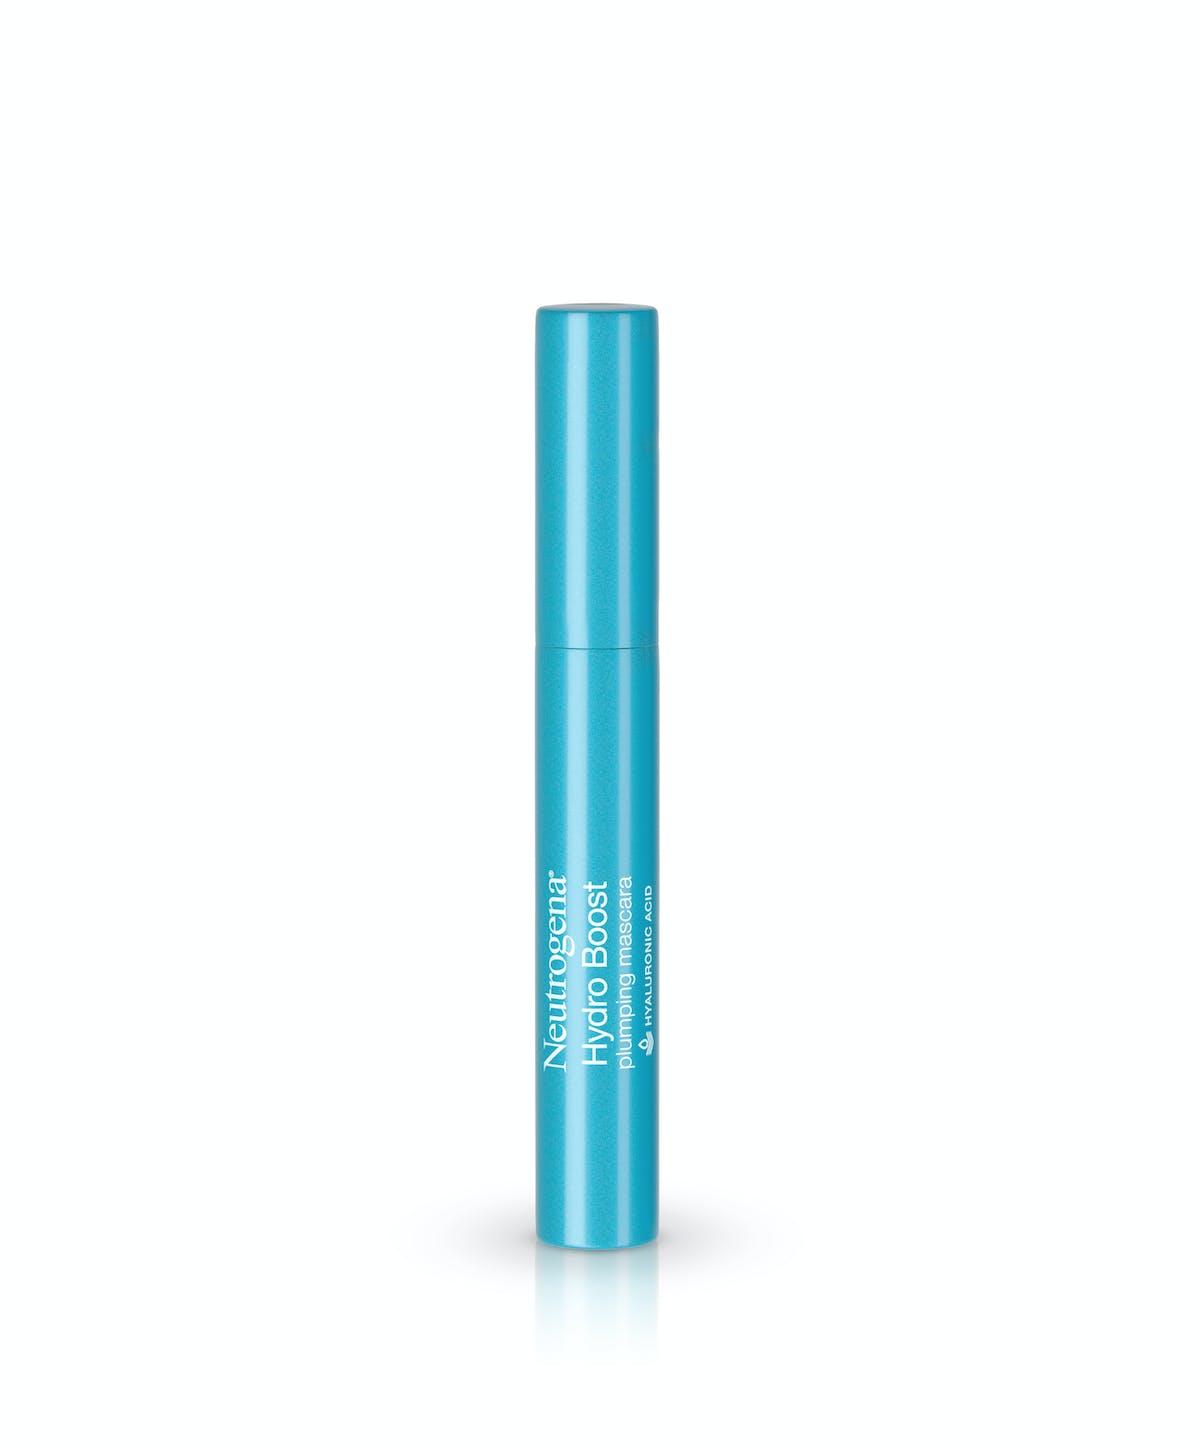 583fe8a06d3 ... Neutrogena® Hydro Boost Plumping Mascara ...